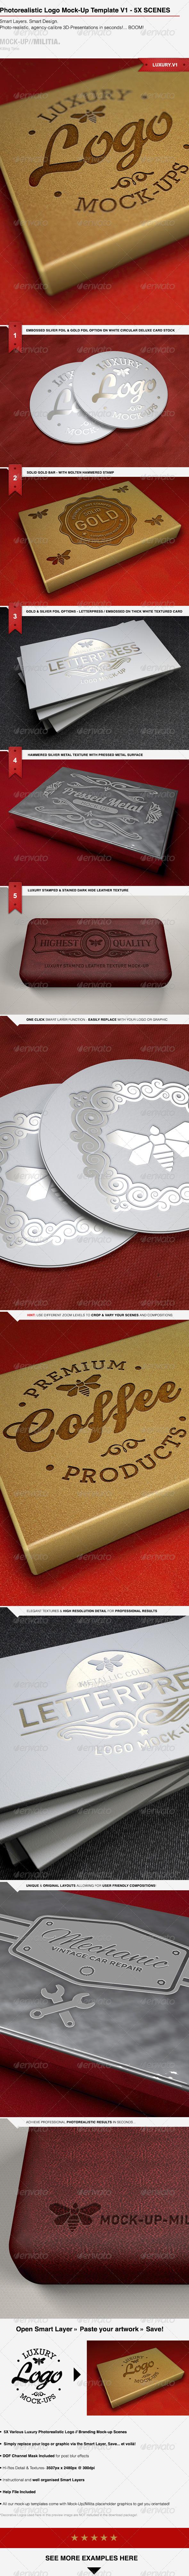 GraphicRiver Photorealistic Logo Mock-Up Product Mock-Up V.1 6706310